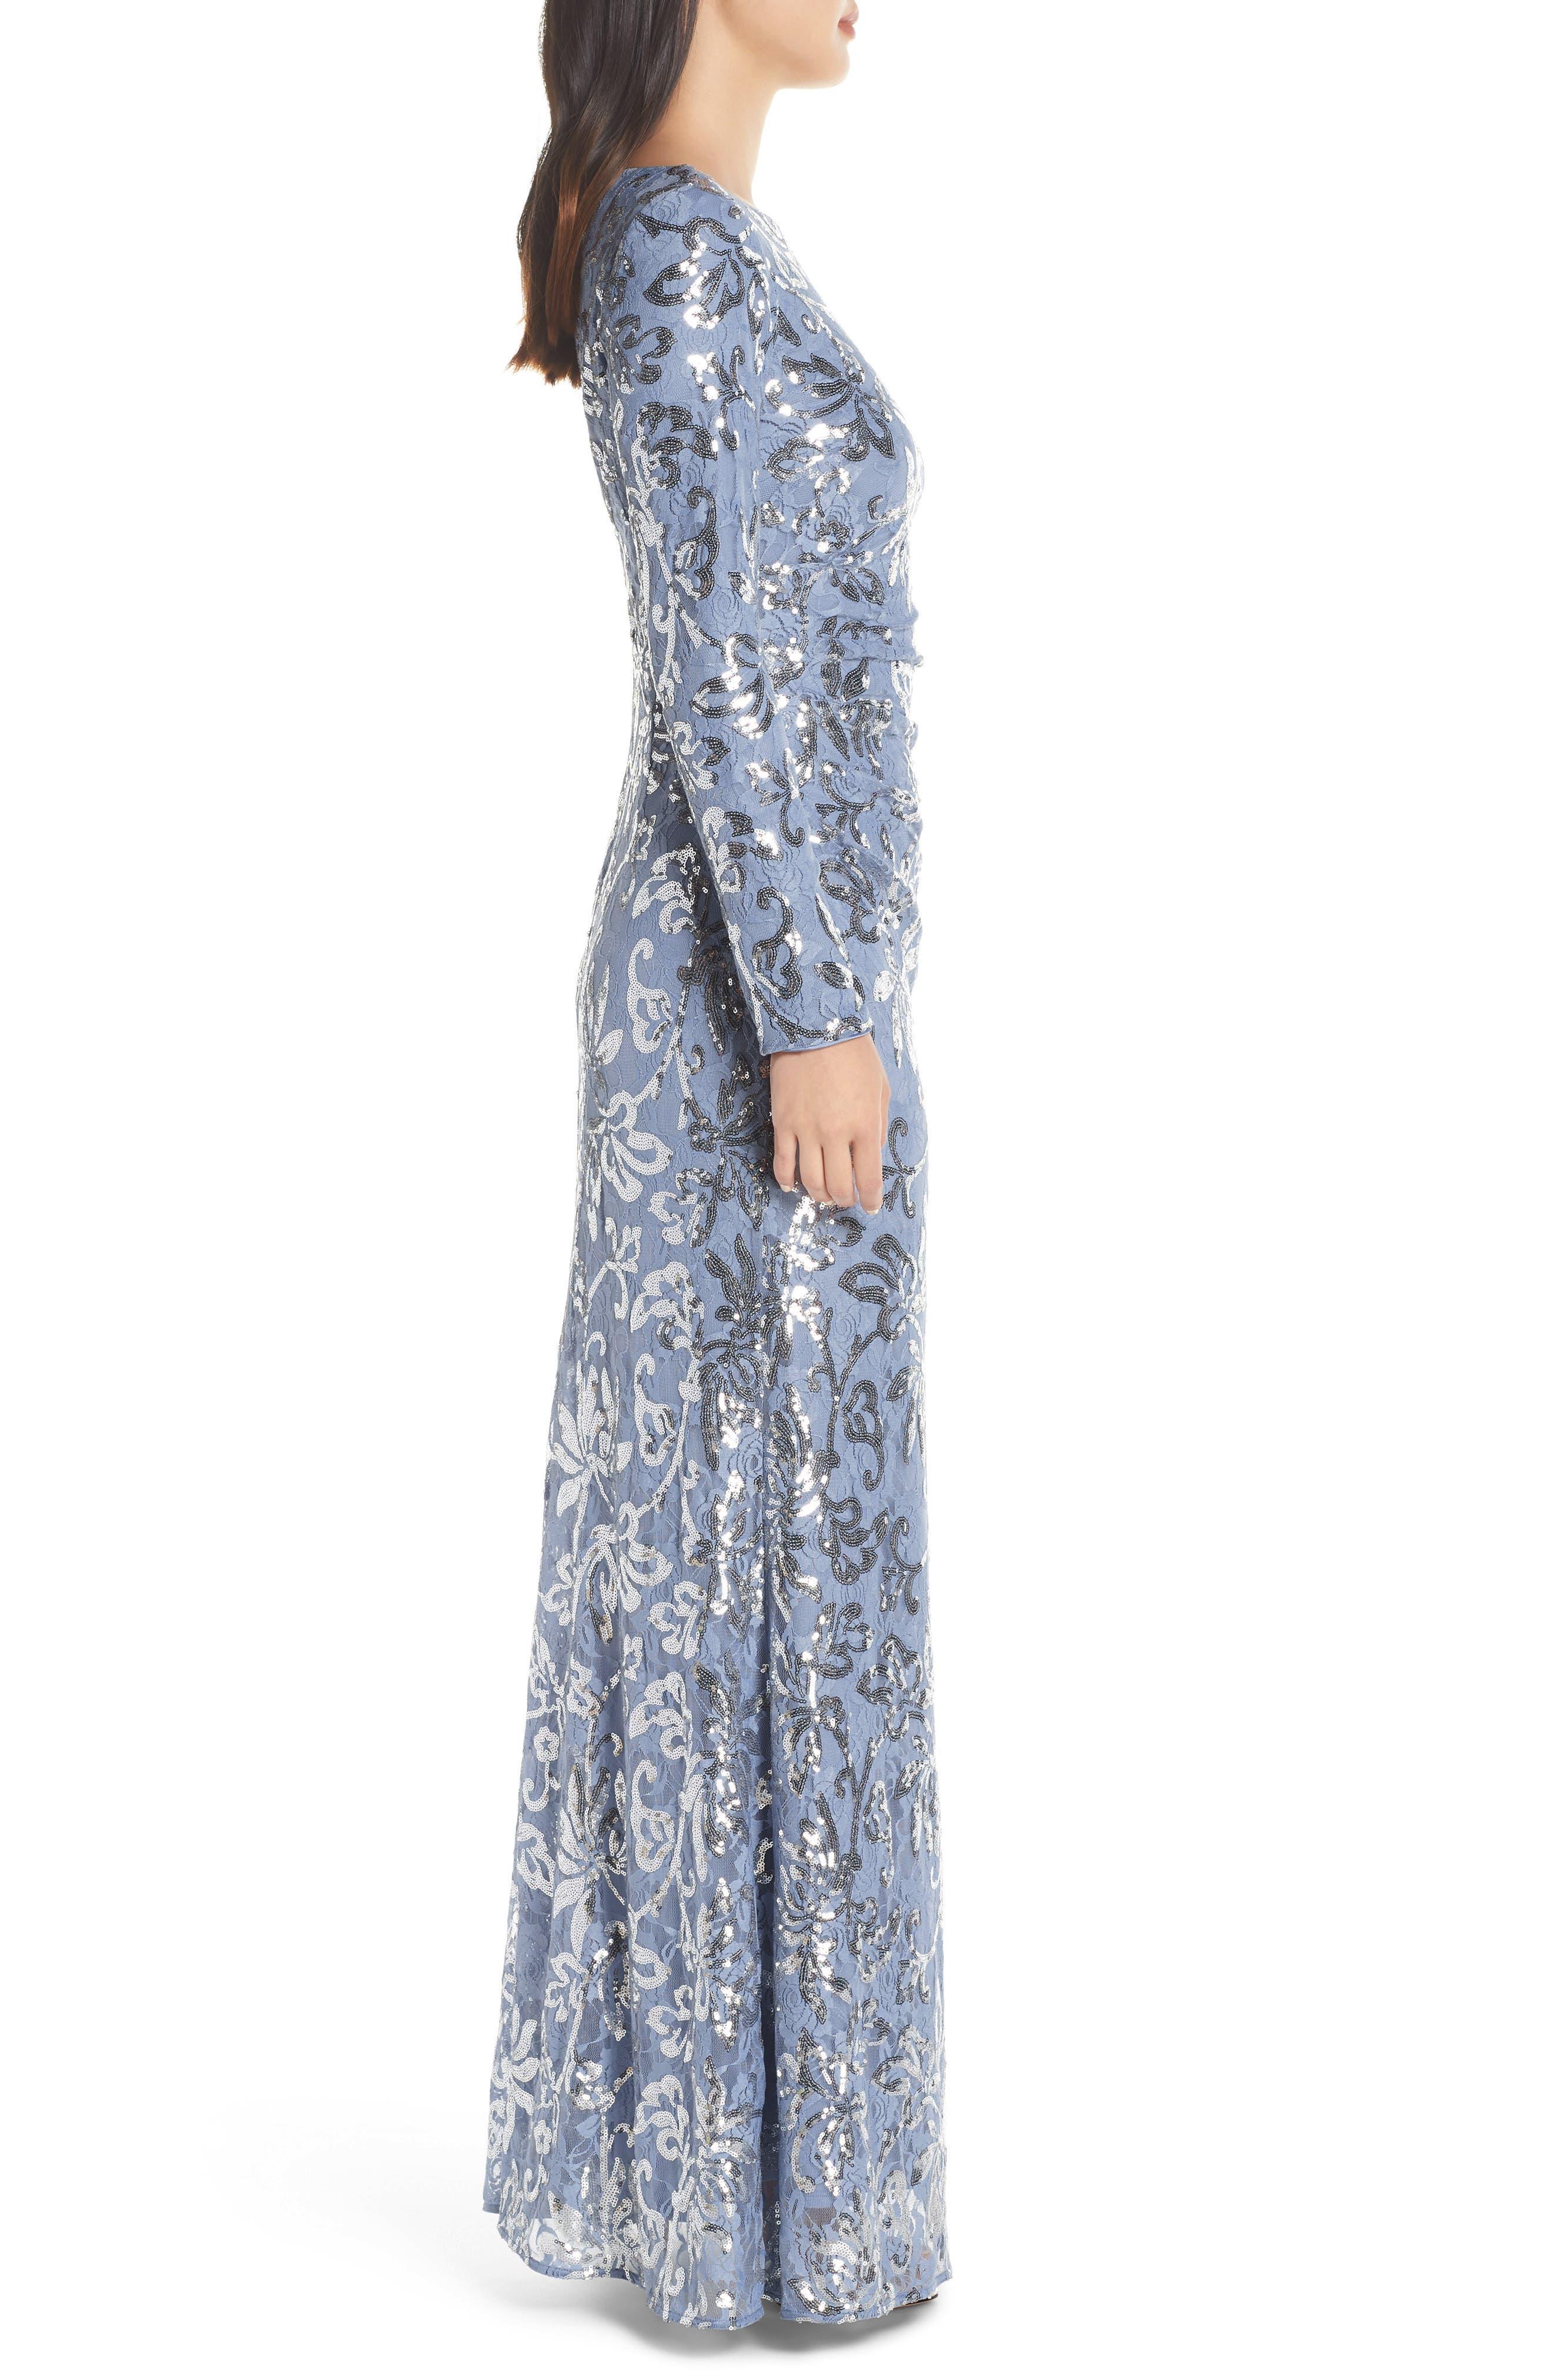 VINCE CAMUTO, Lace & Sequin Evening Dress, Alternate thumbnail 4, color, SKY BLUE